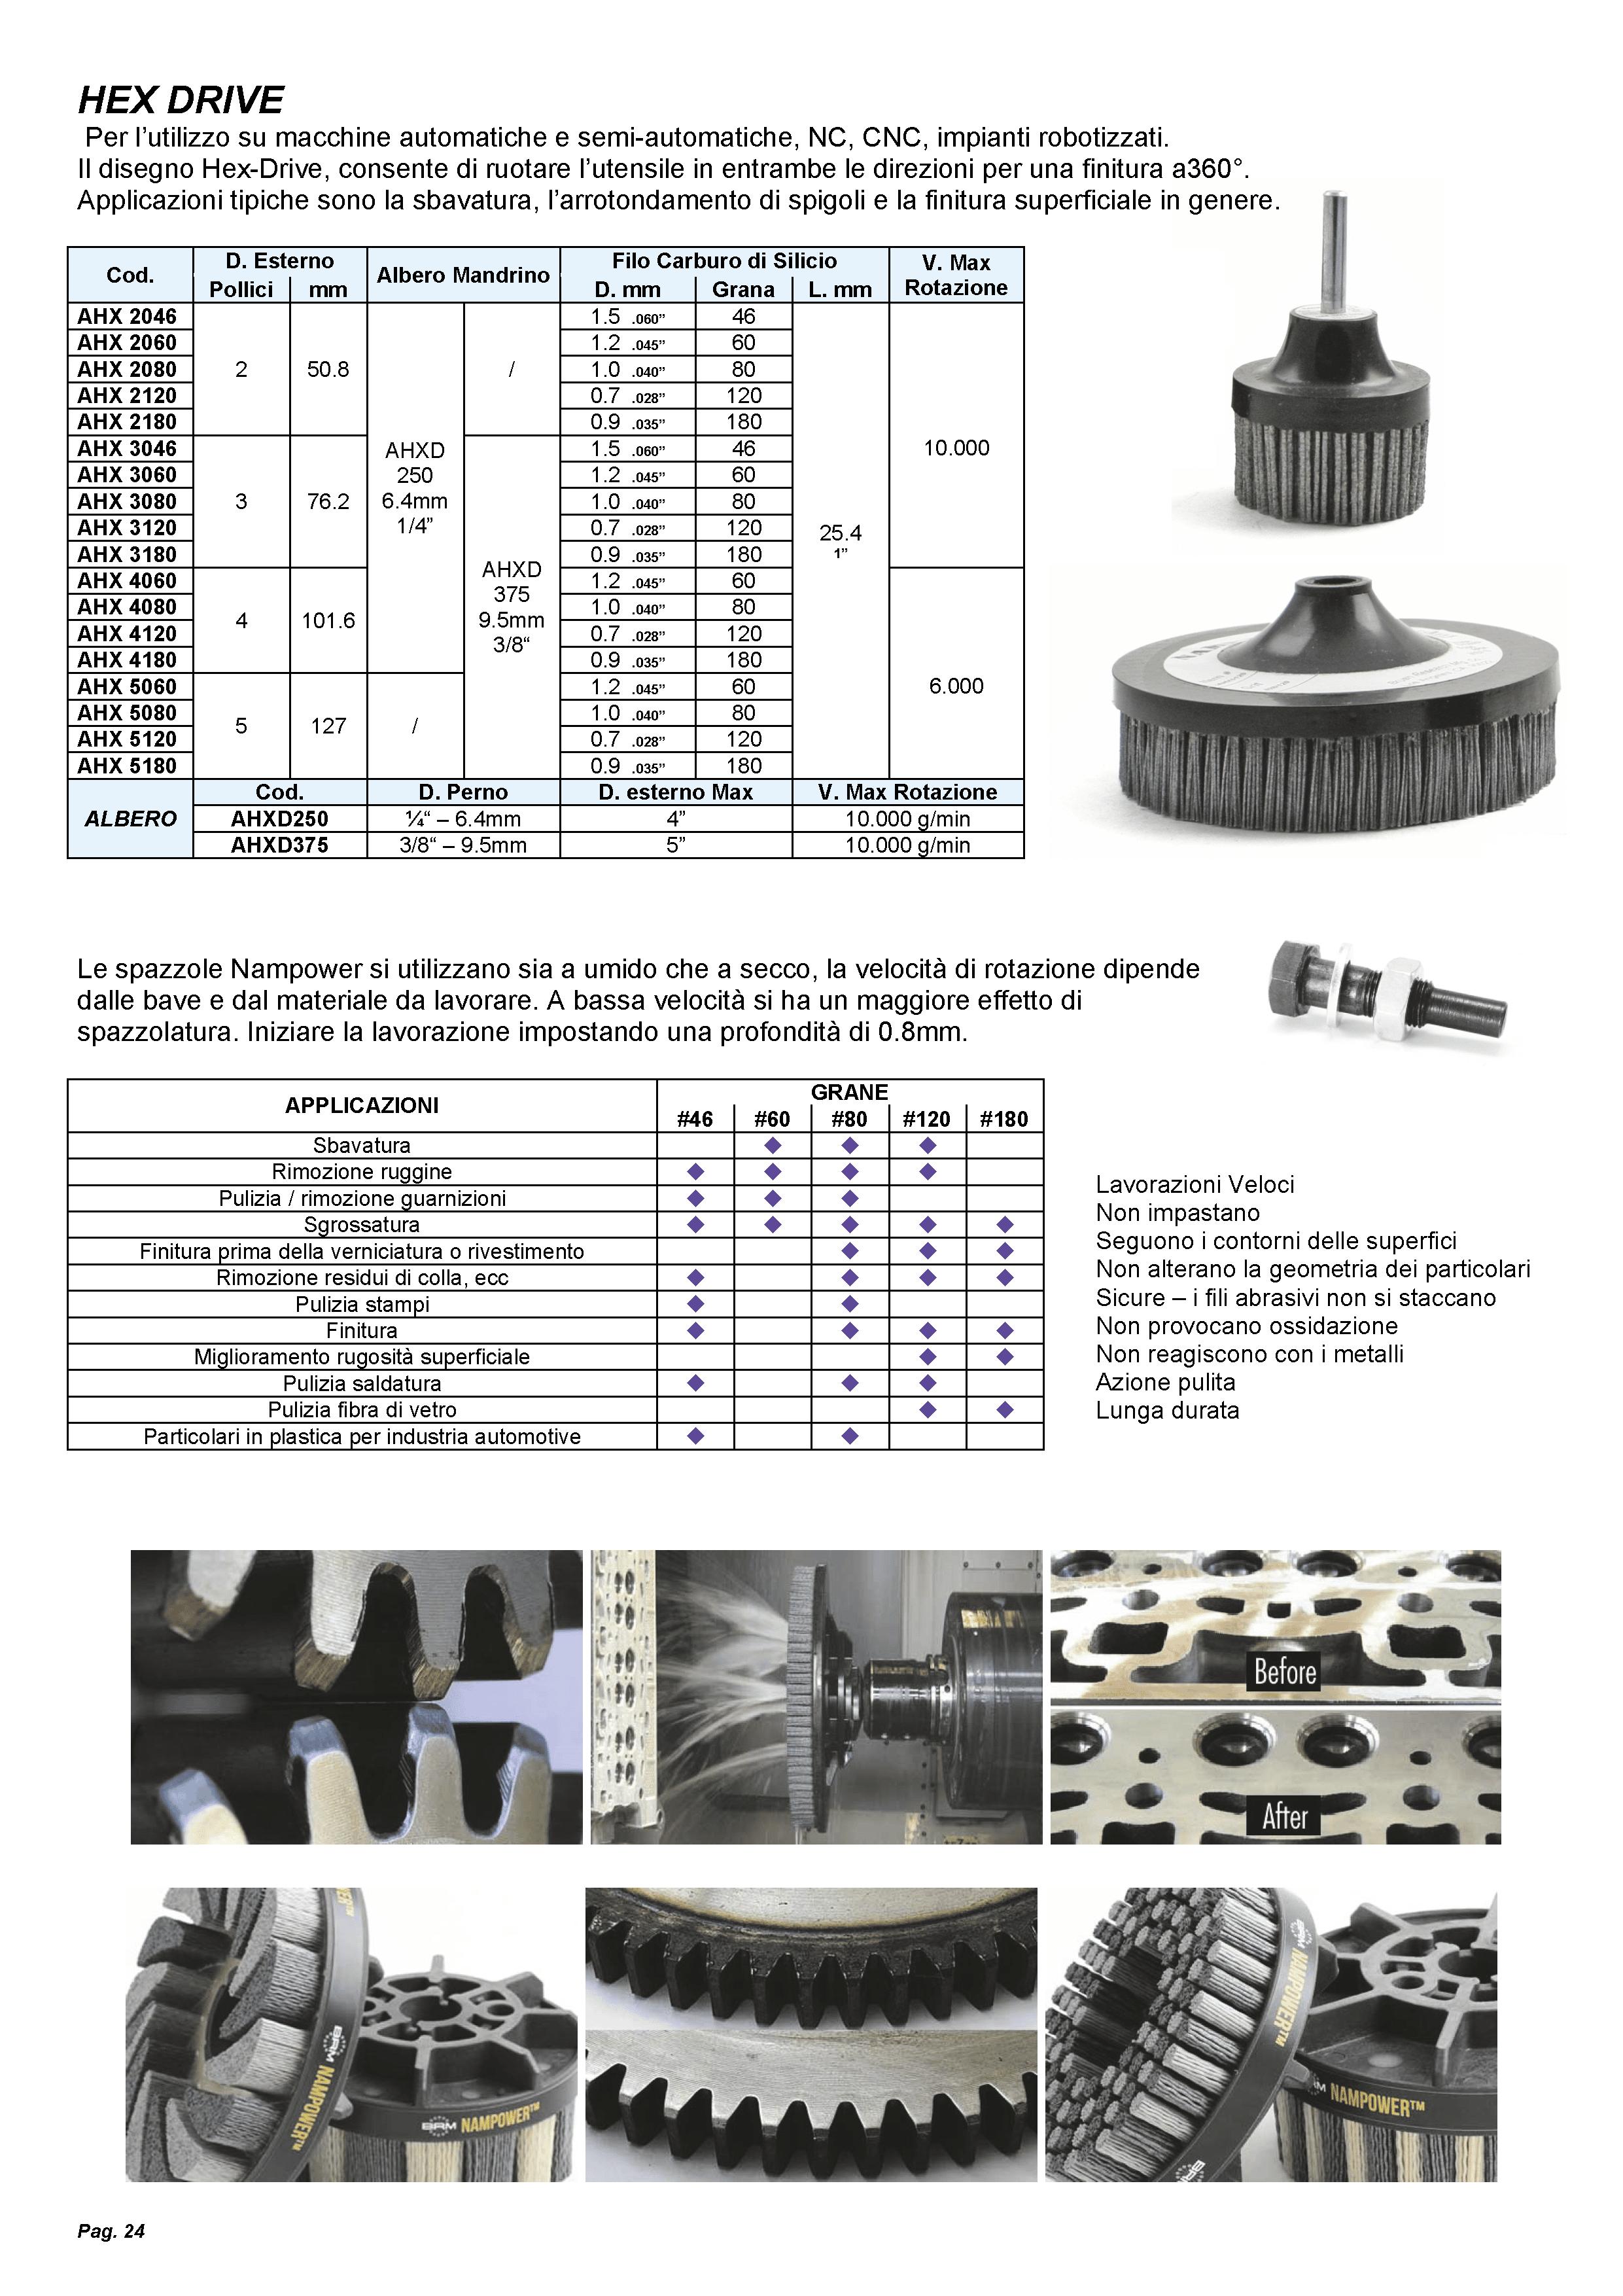 24-spazzole-frontali-hex-drive-nampower-sbavatura-finitura-cnc